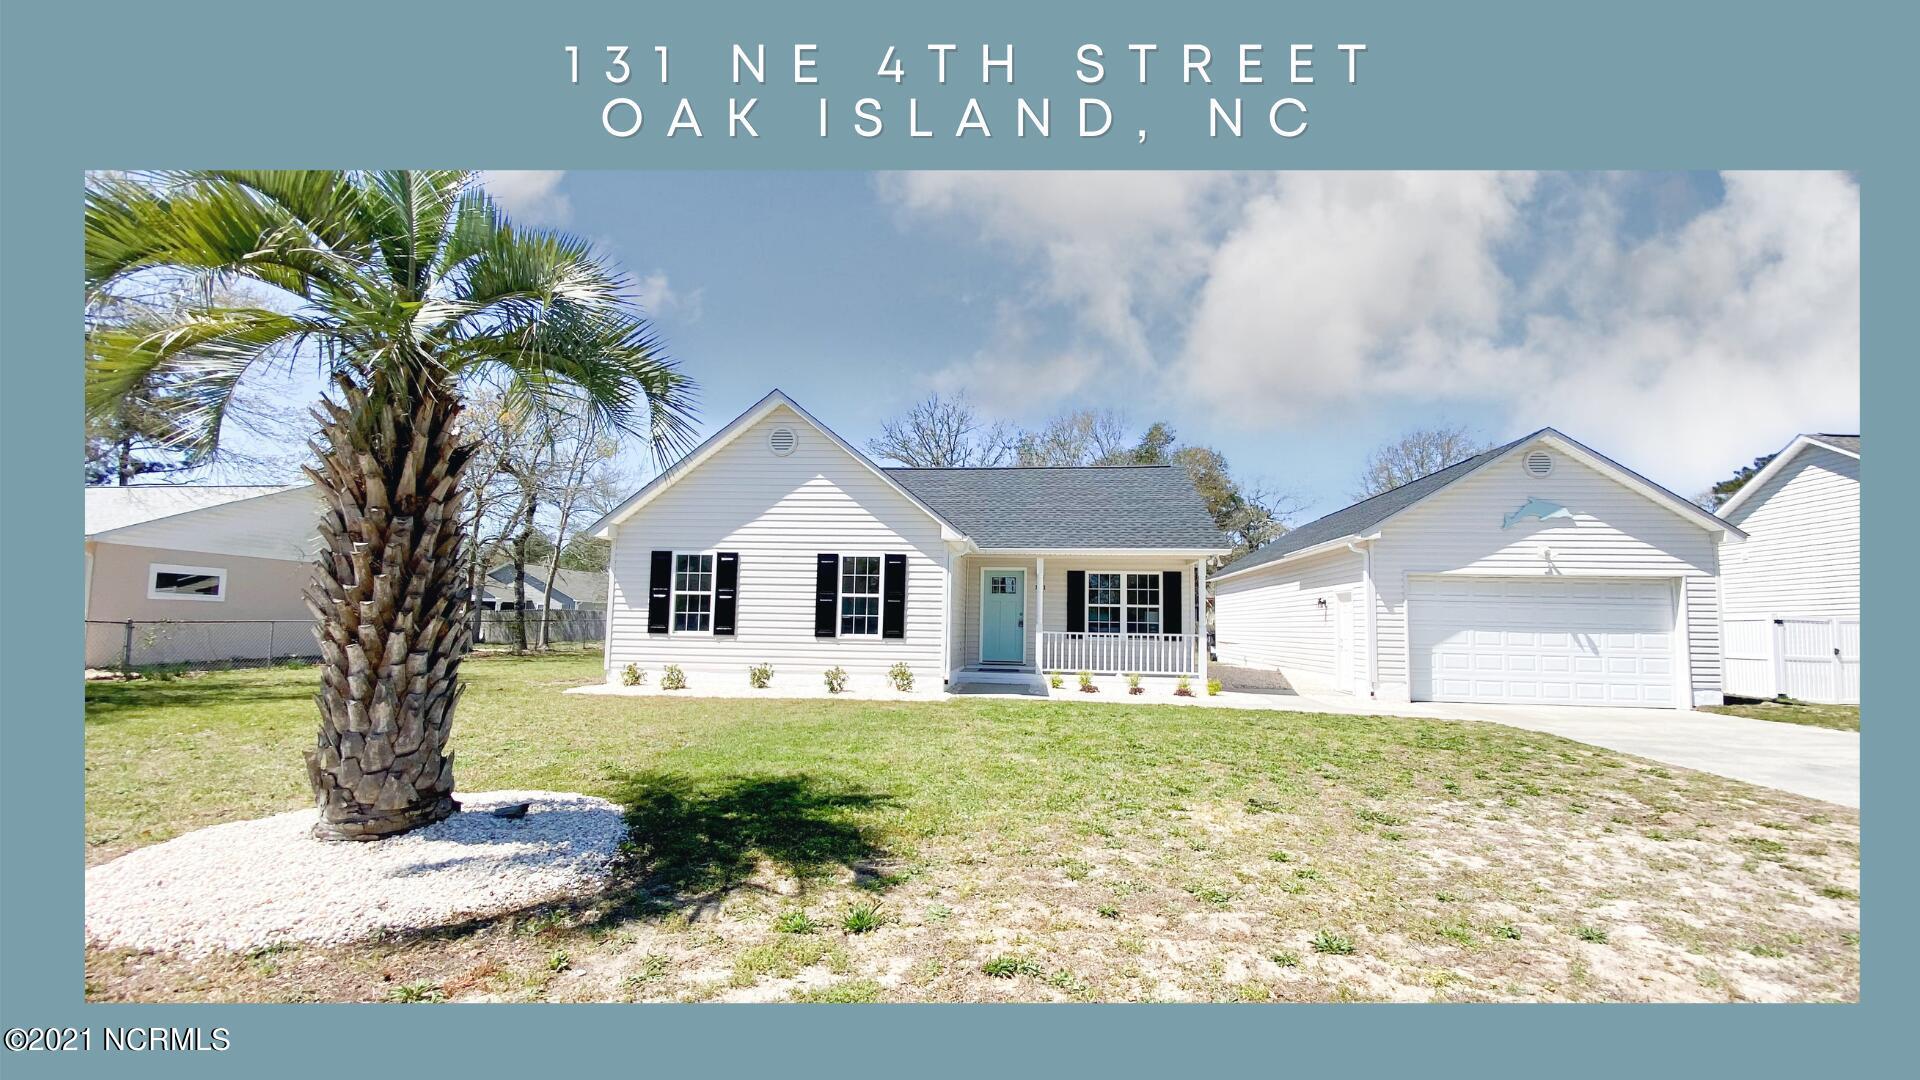 131 NE 4th Street Oak Island, NC 28465